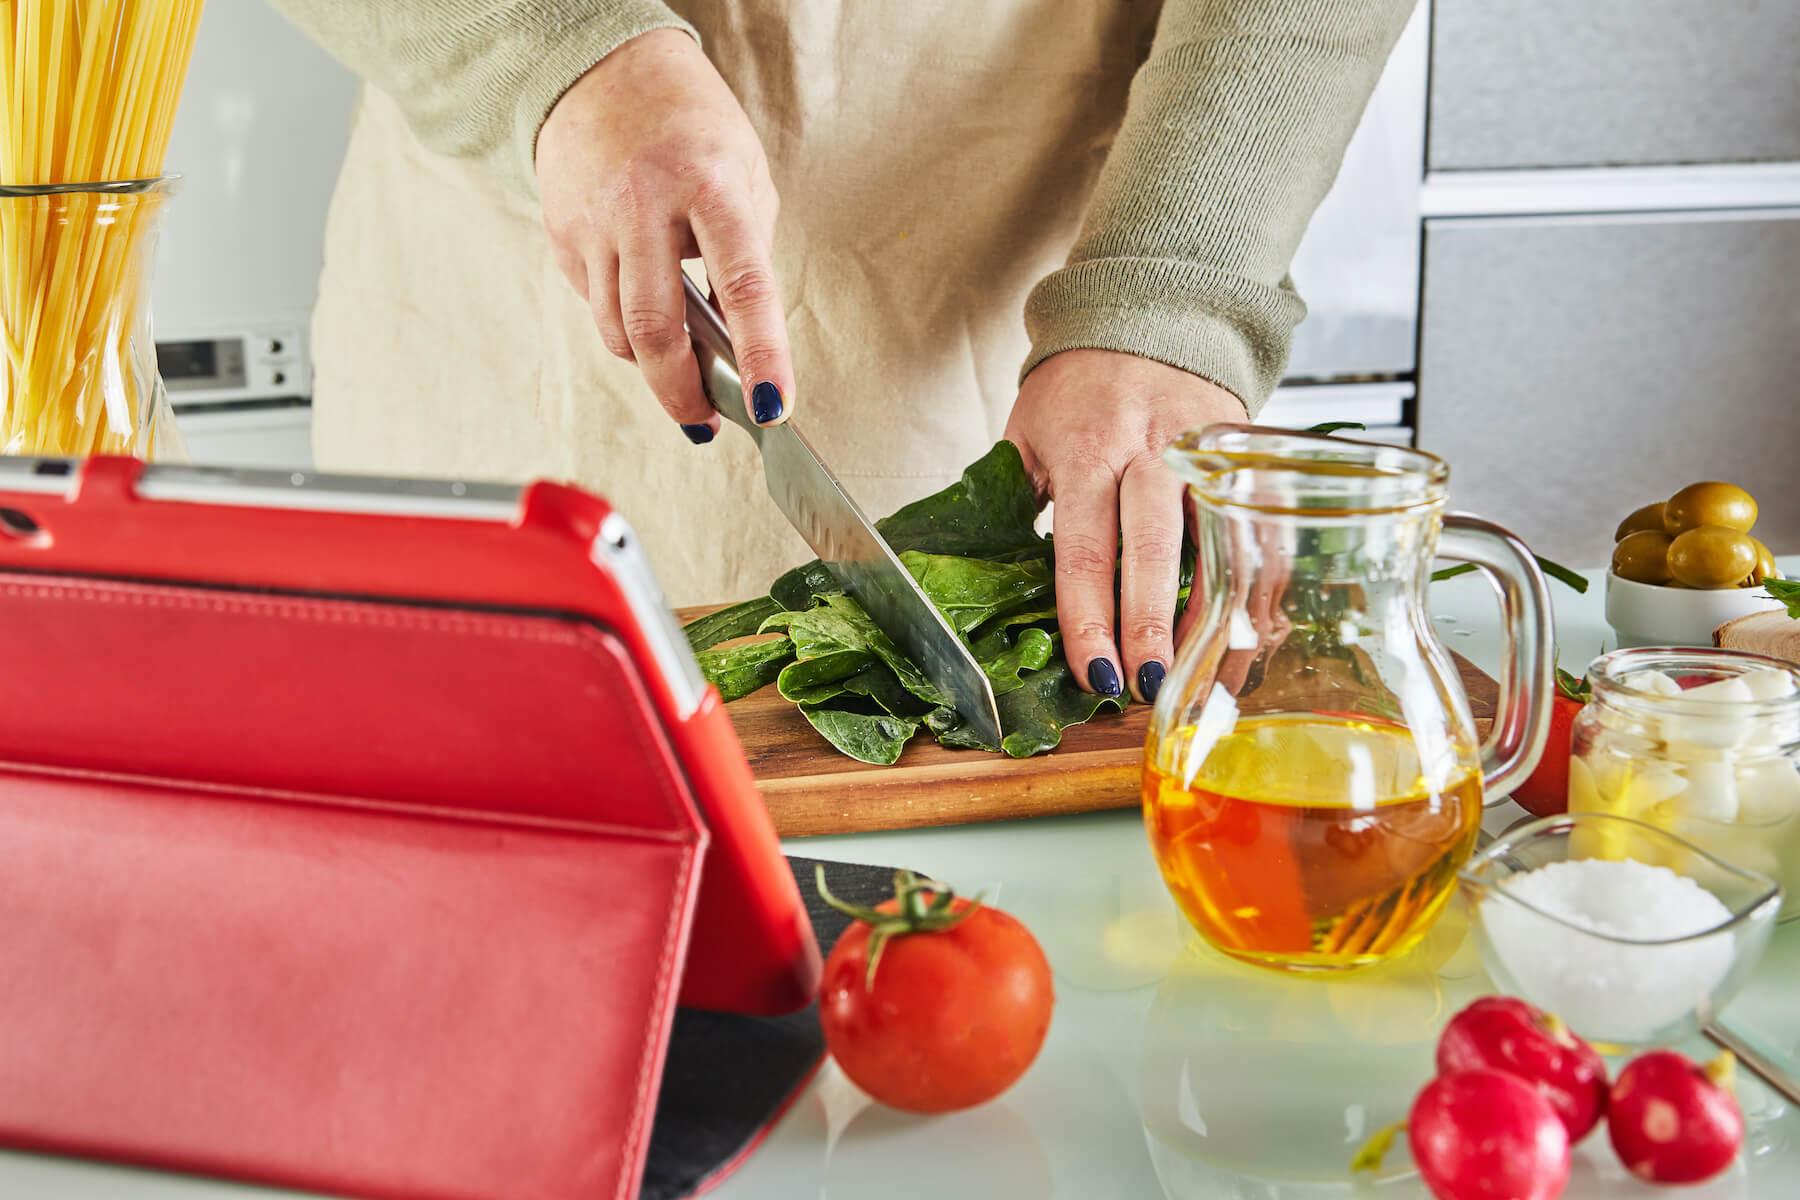 Frau schneidet Gemüse vor Tablet